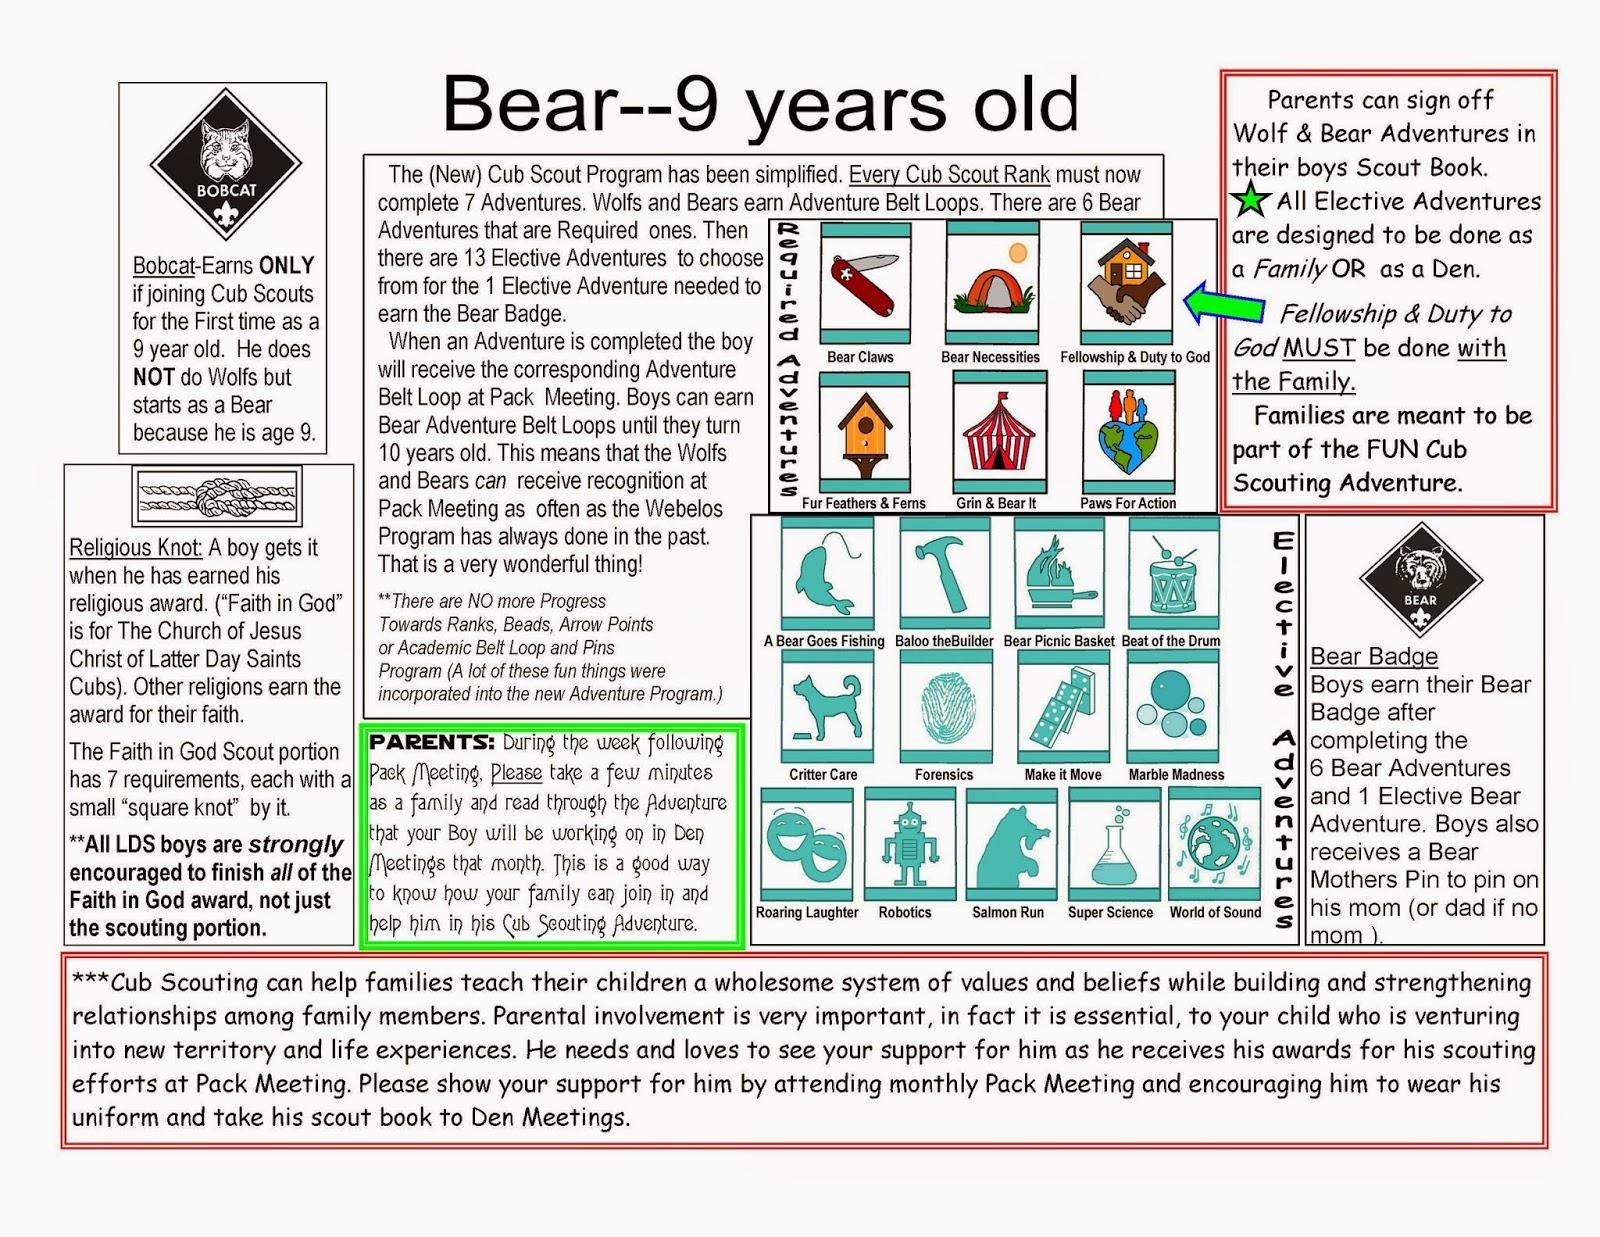 New Cub Scout Stuff New Cub Scout Bear Basics